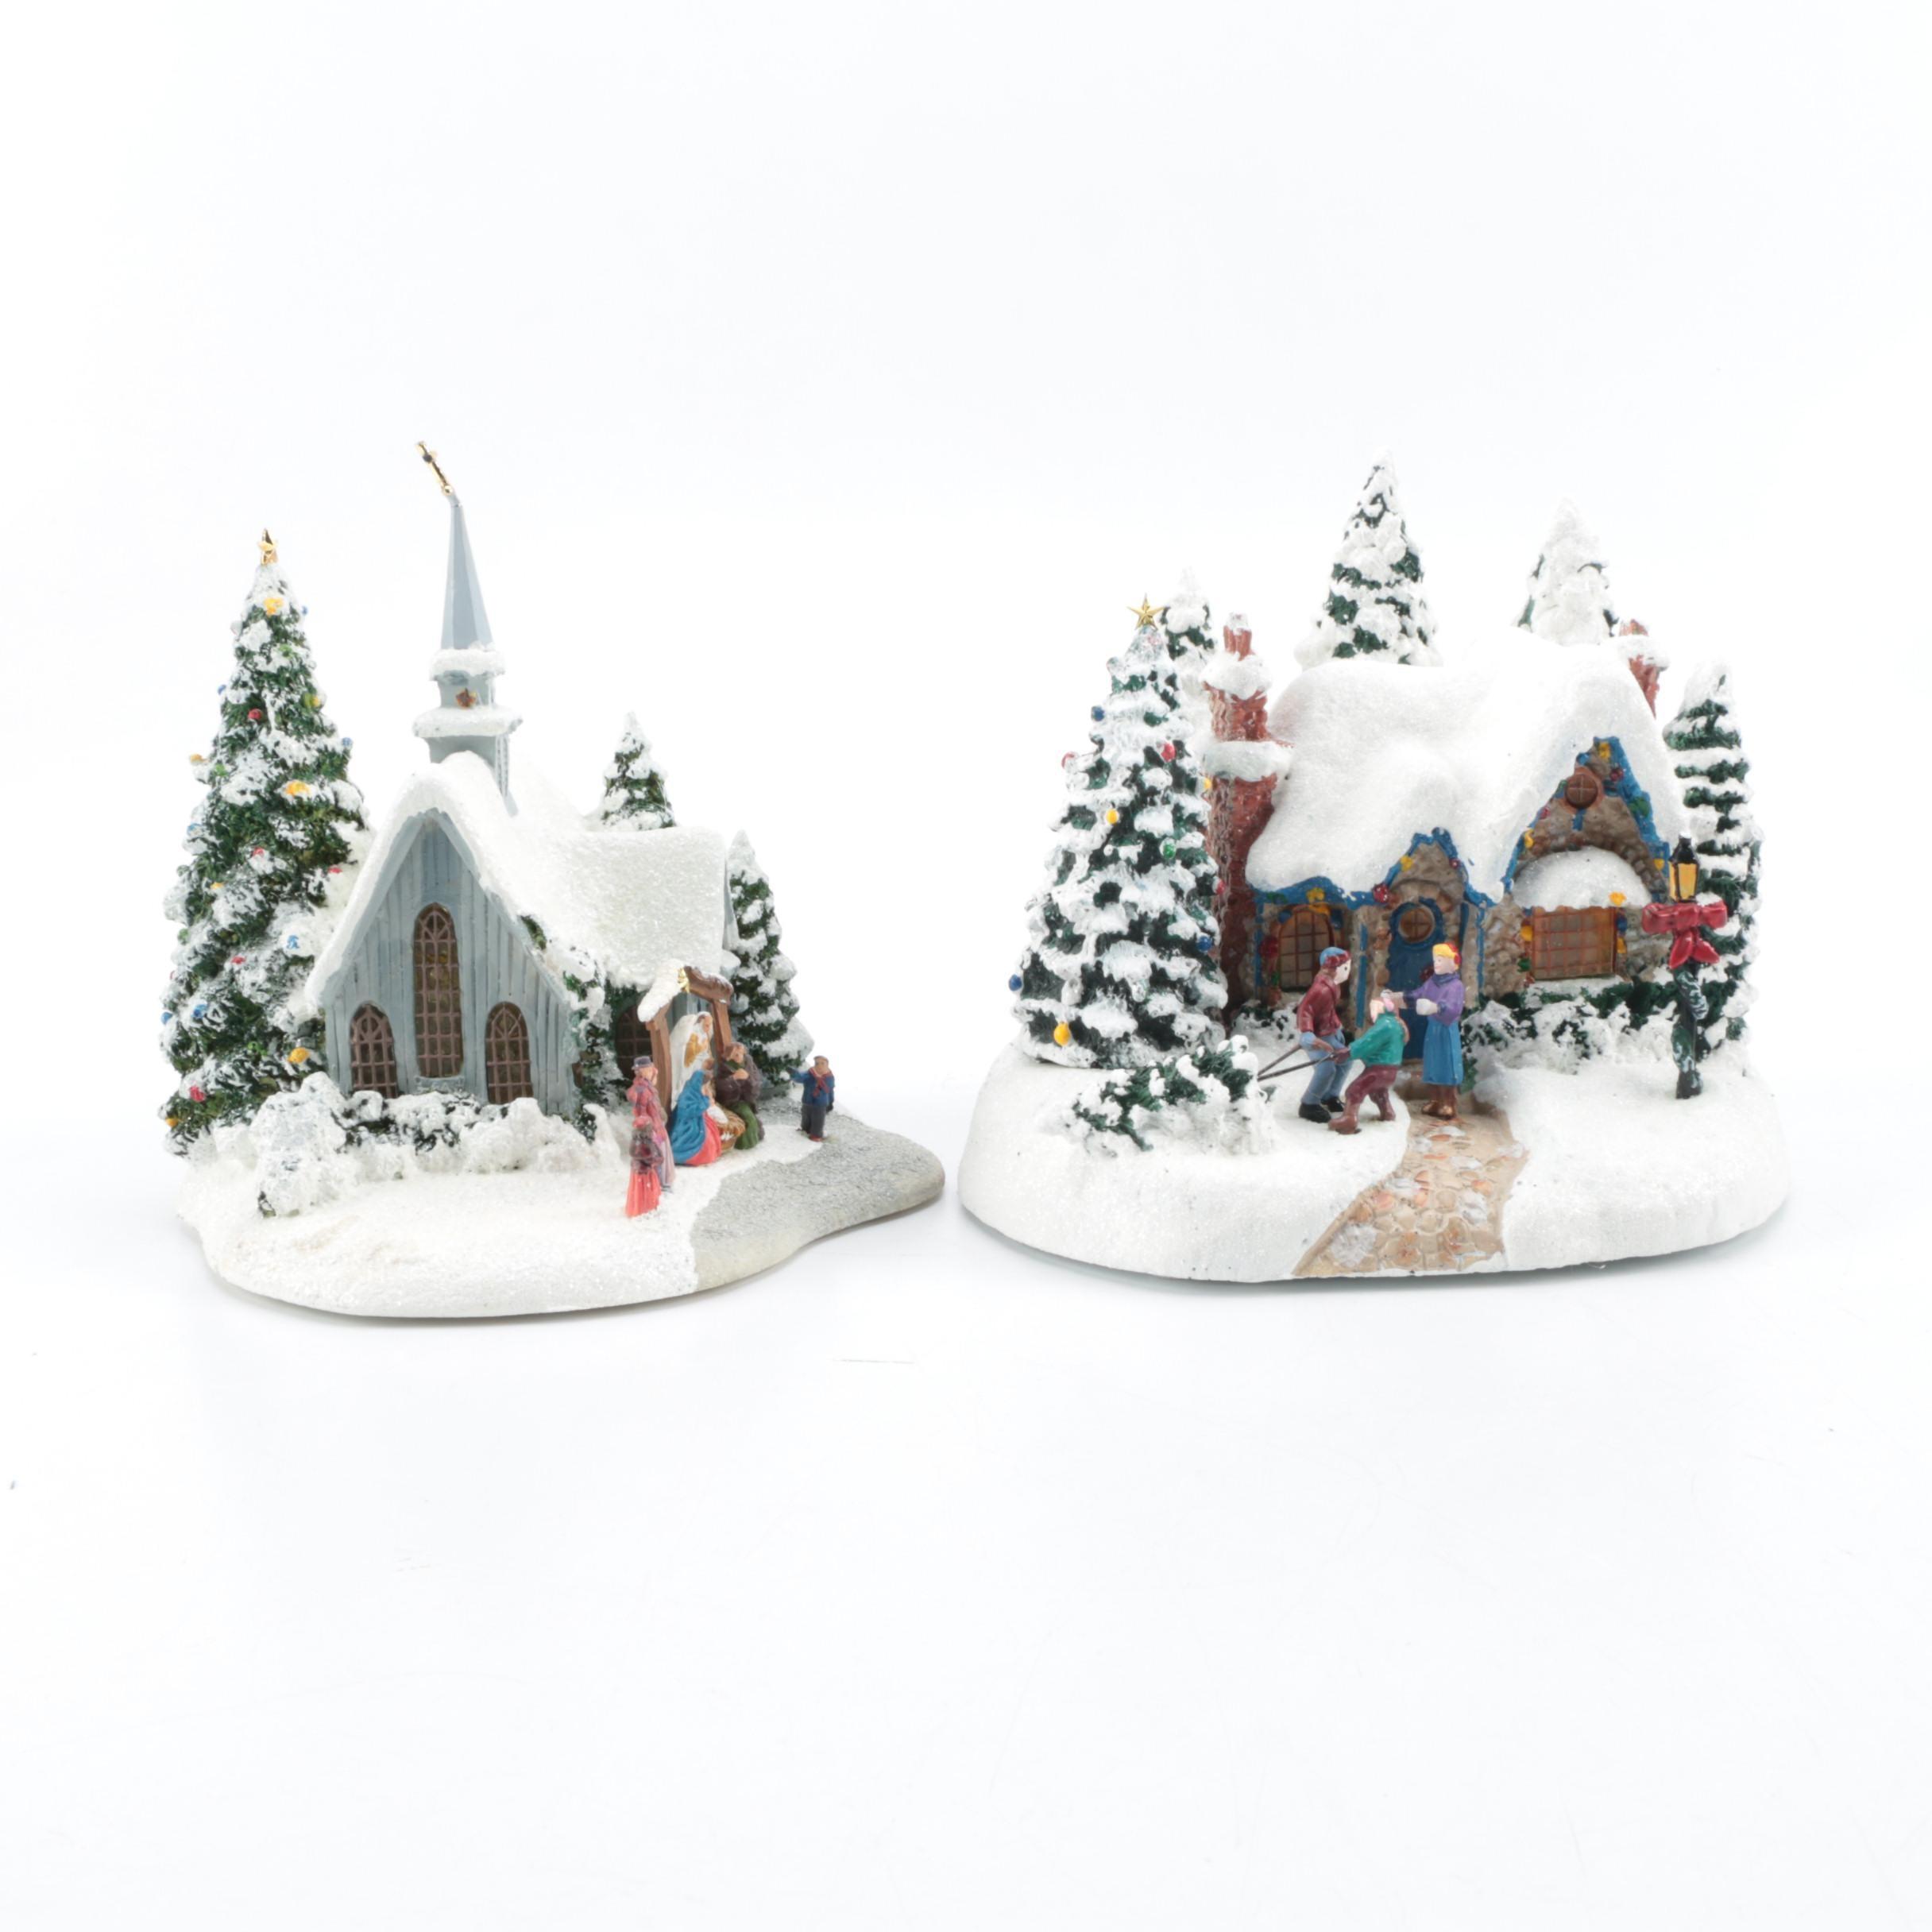 Pair of Christmas Building Figurines